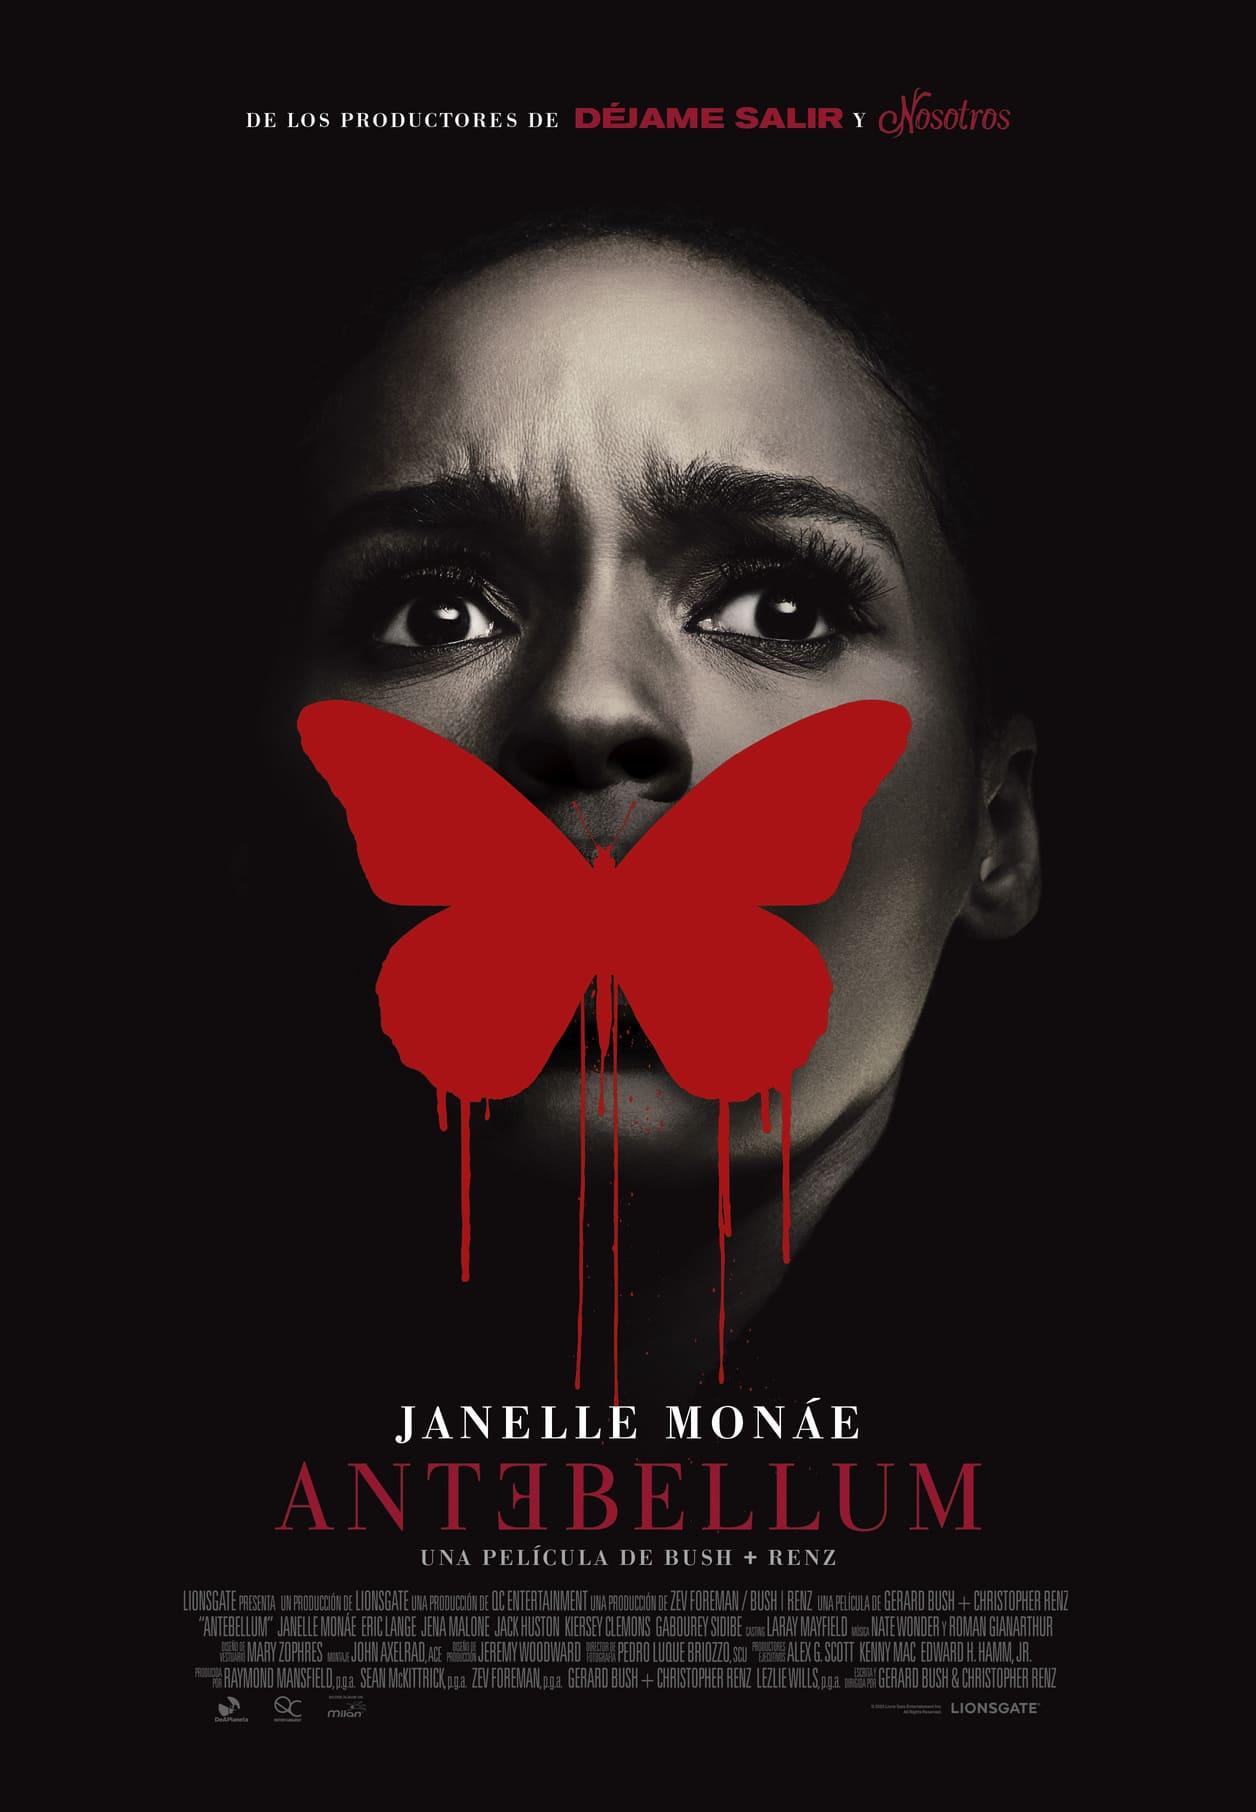 Cartel de cine de la película Antebellum